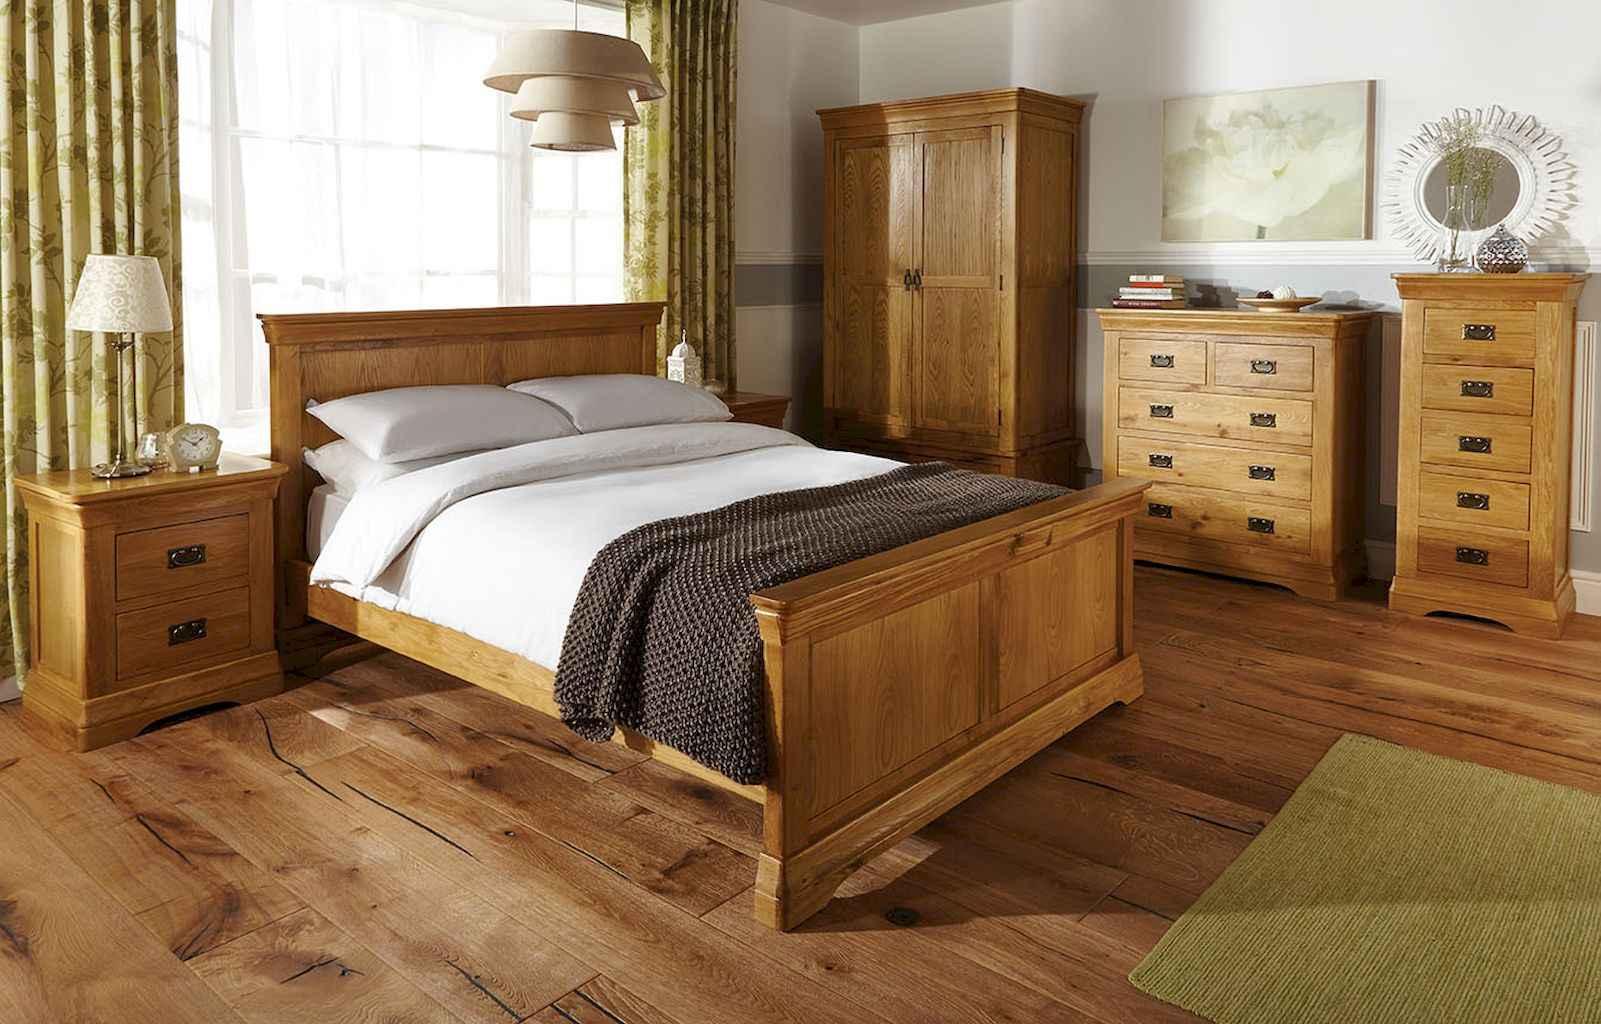 100 Stunning Farmhouse Master Bedroom Decor Ideas (72)